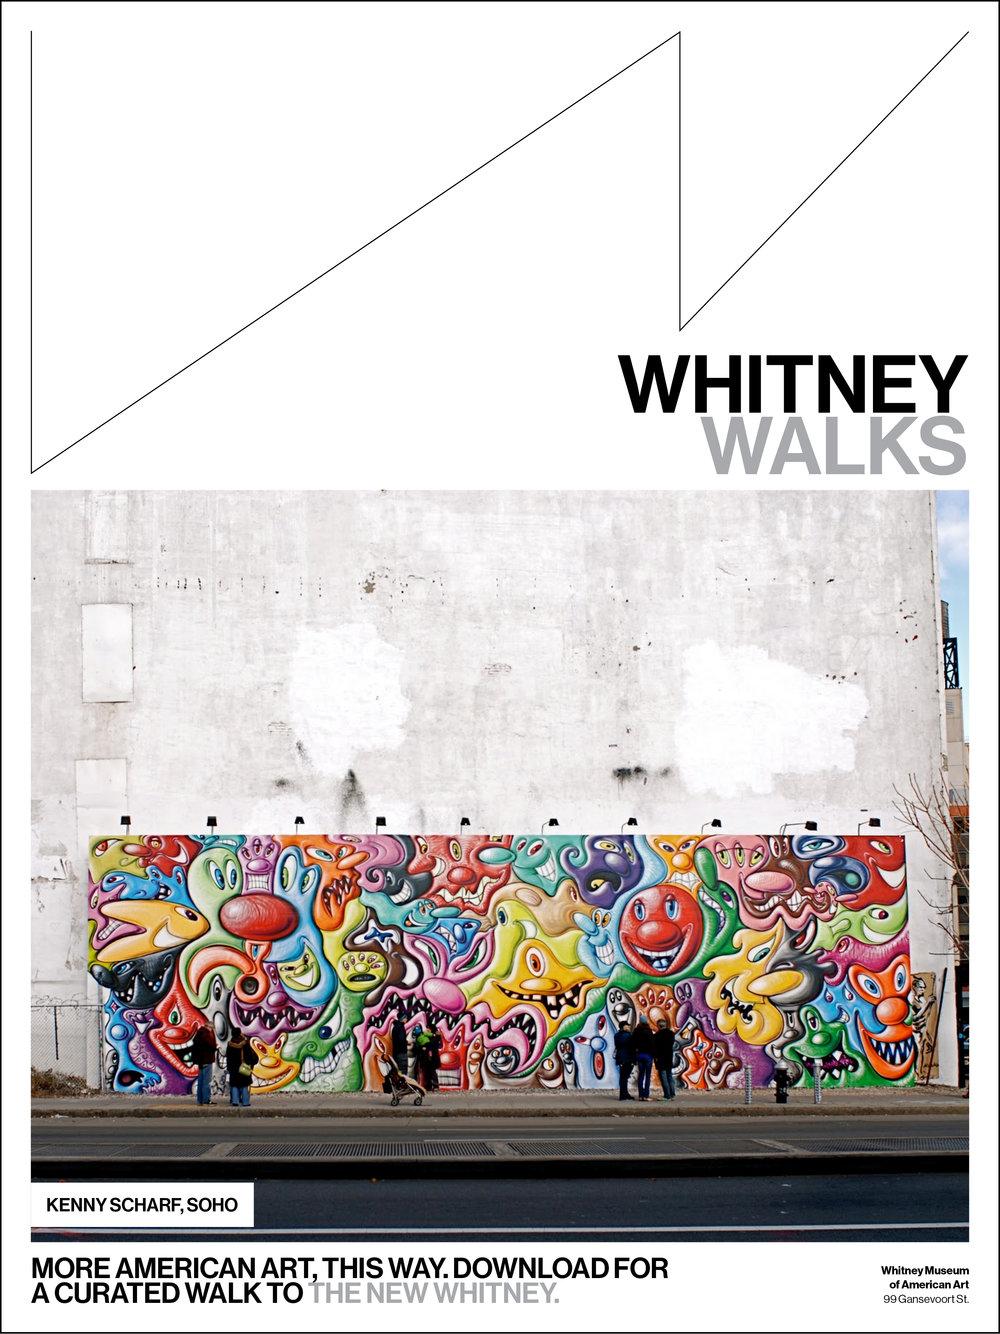 Whitney_WhitneyWalks_Print-1.jpg